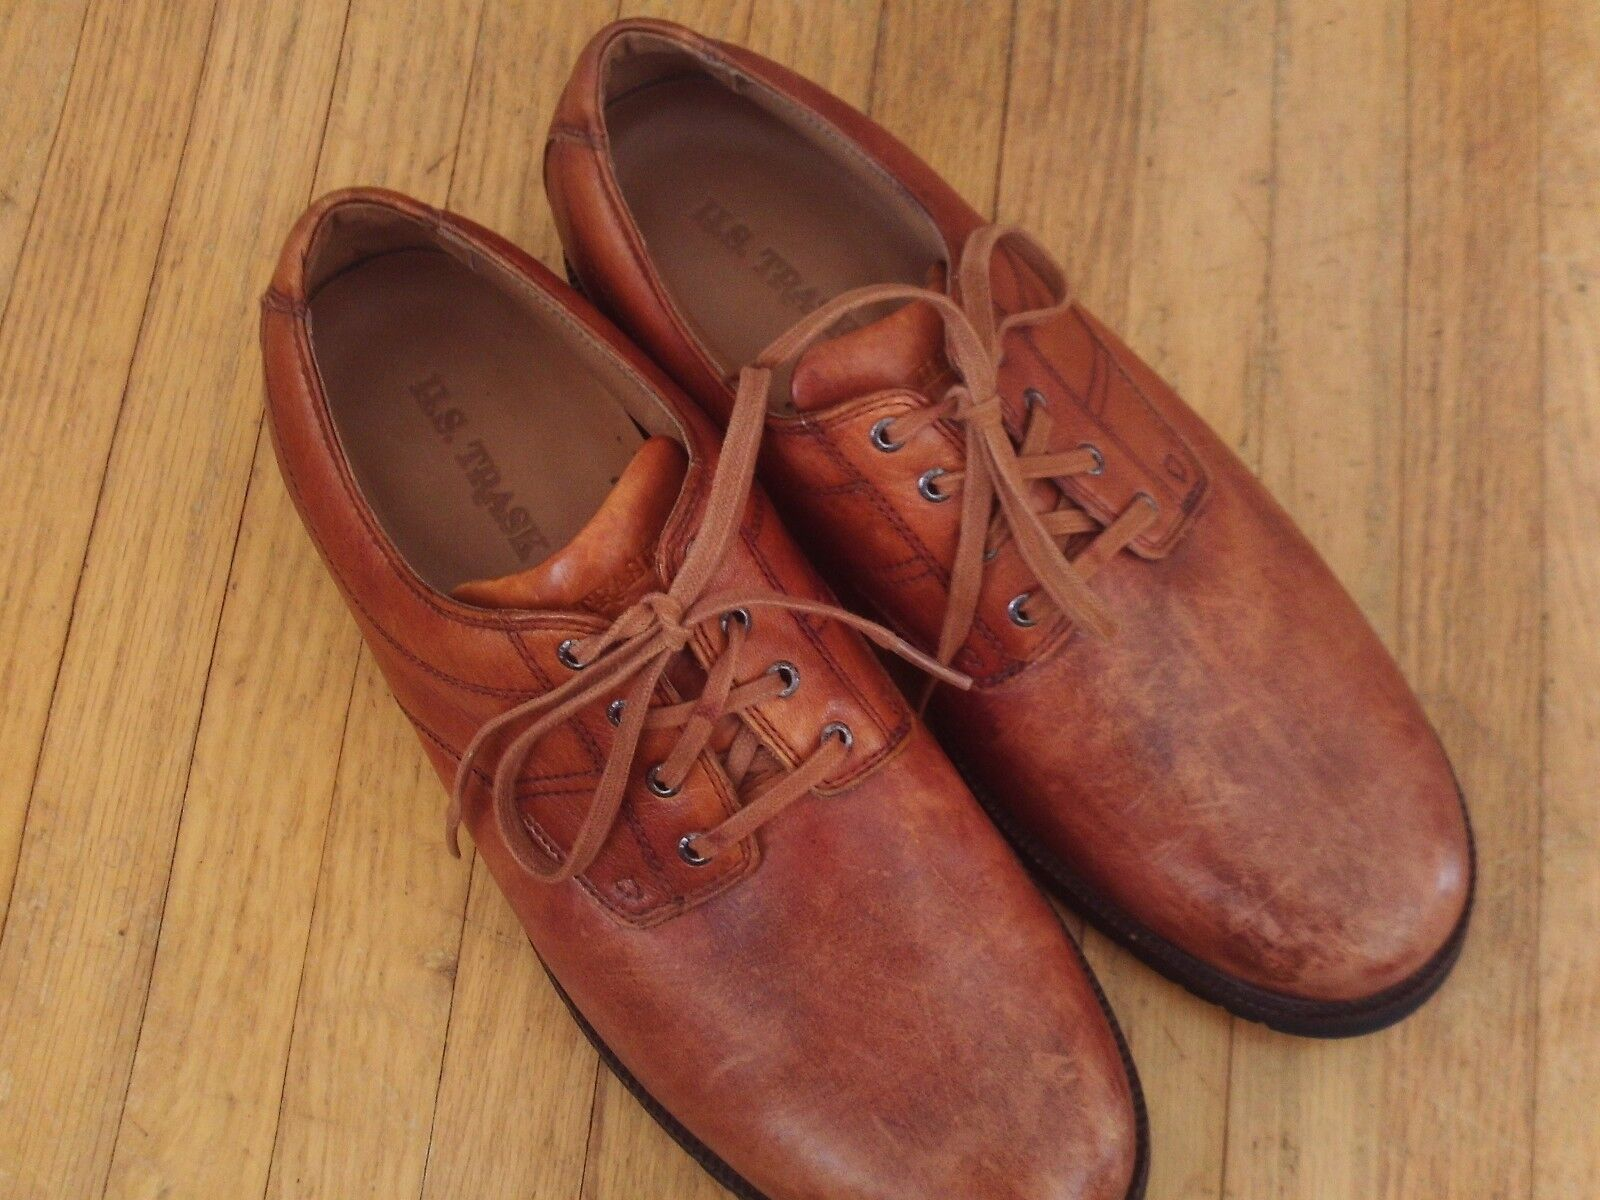 HS Trask Gallatin ES Plain tan bison leather mens 9.5 M oxfords lace up shoes